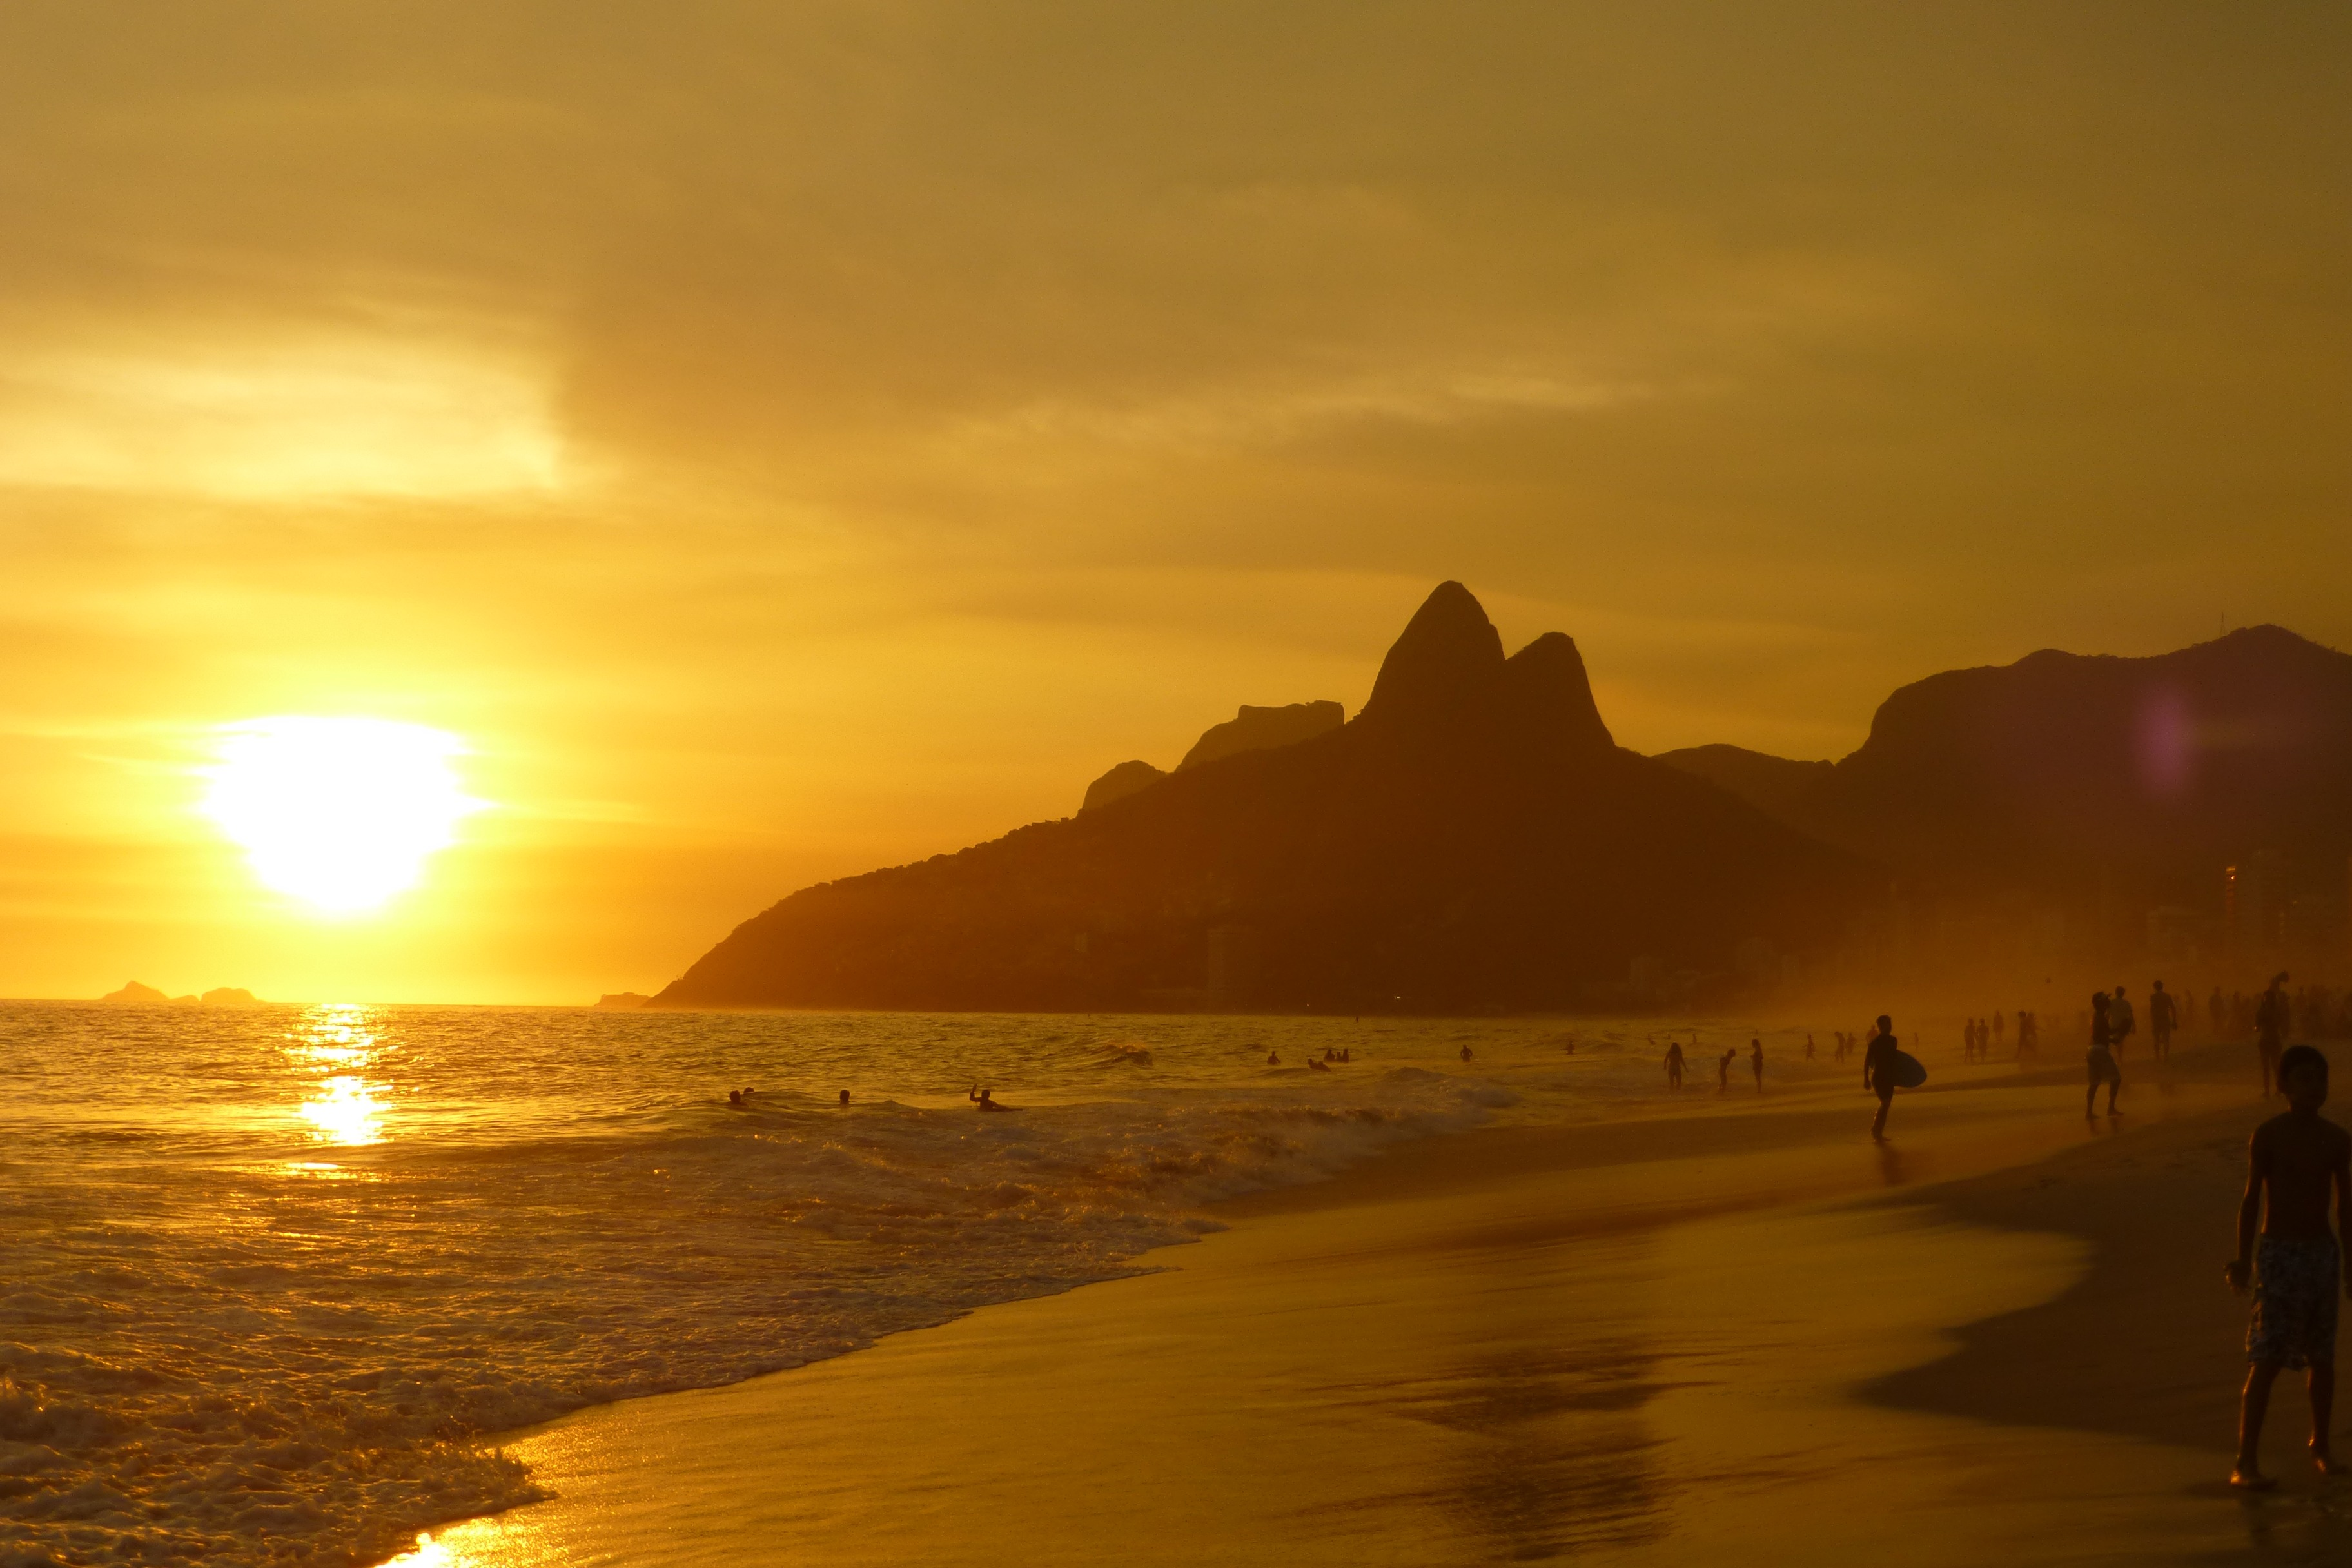 Carmo - Rio de Janeiro